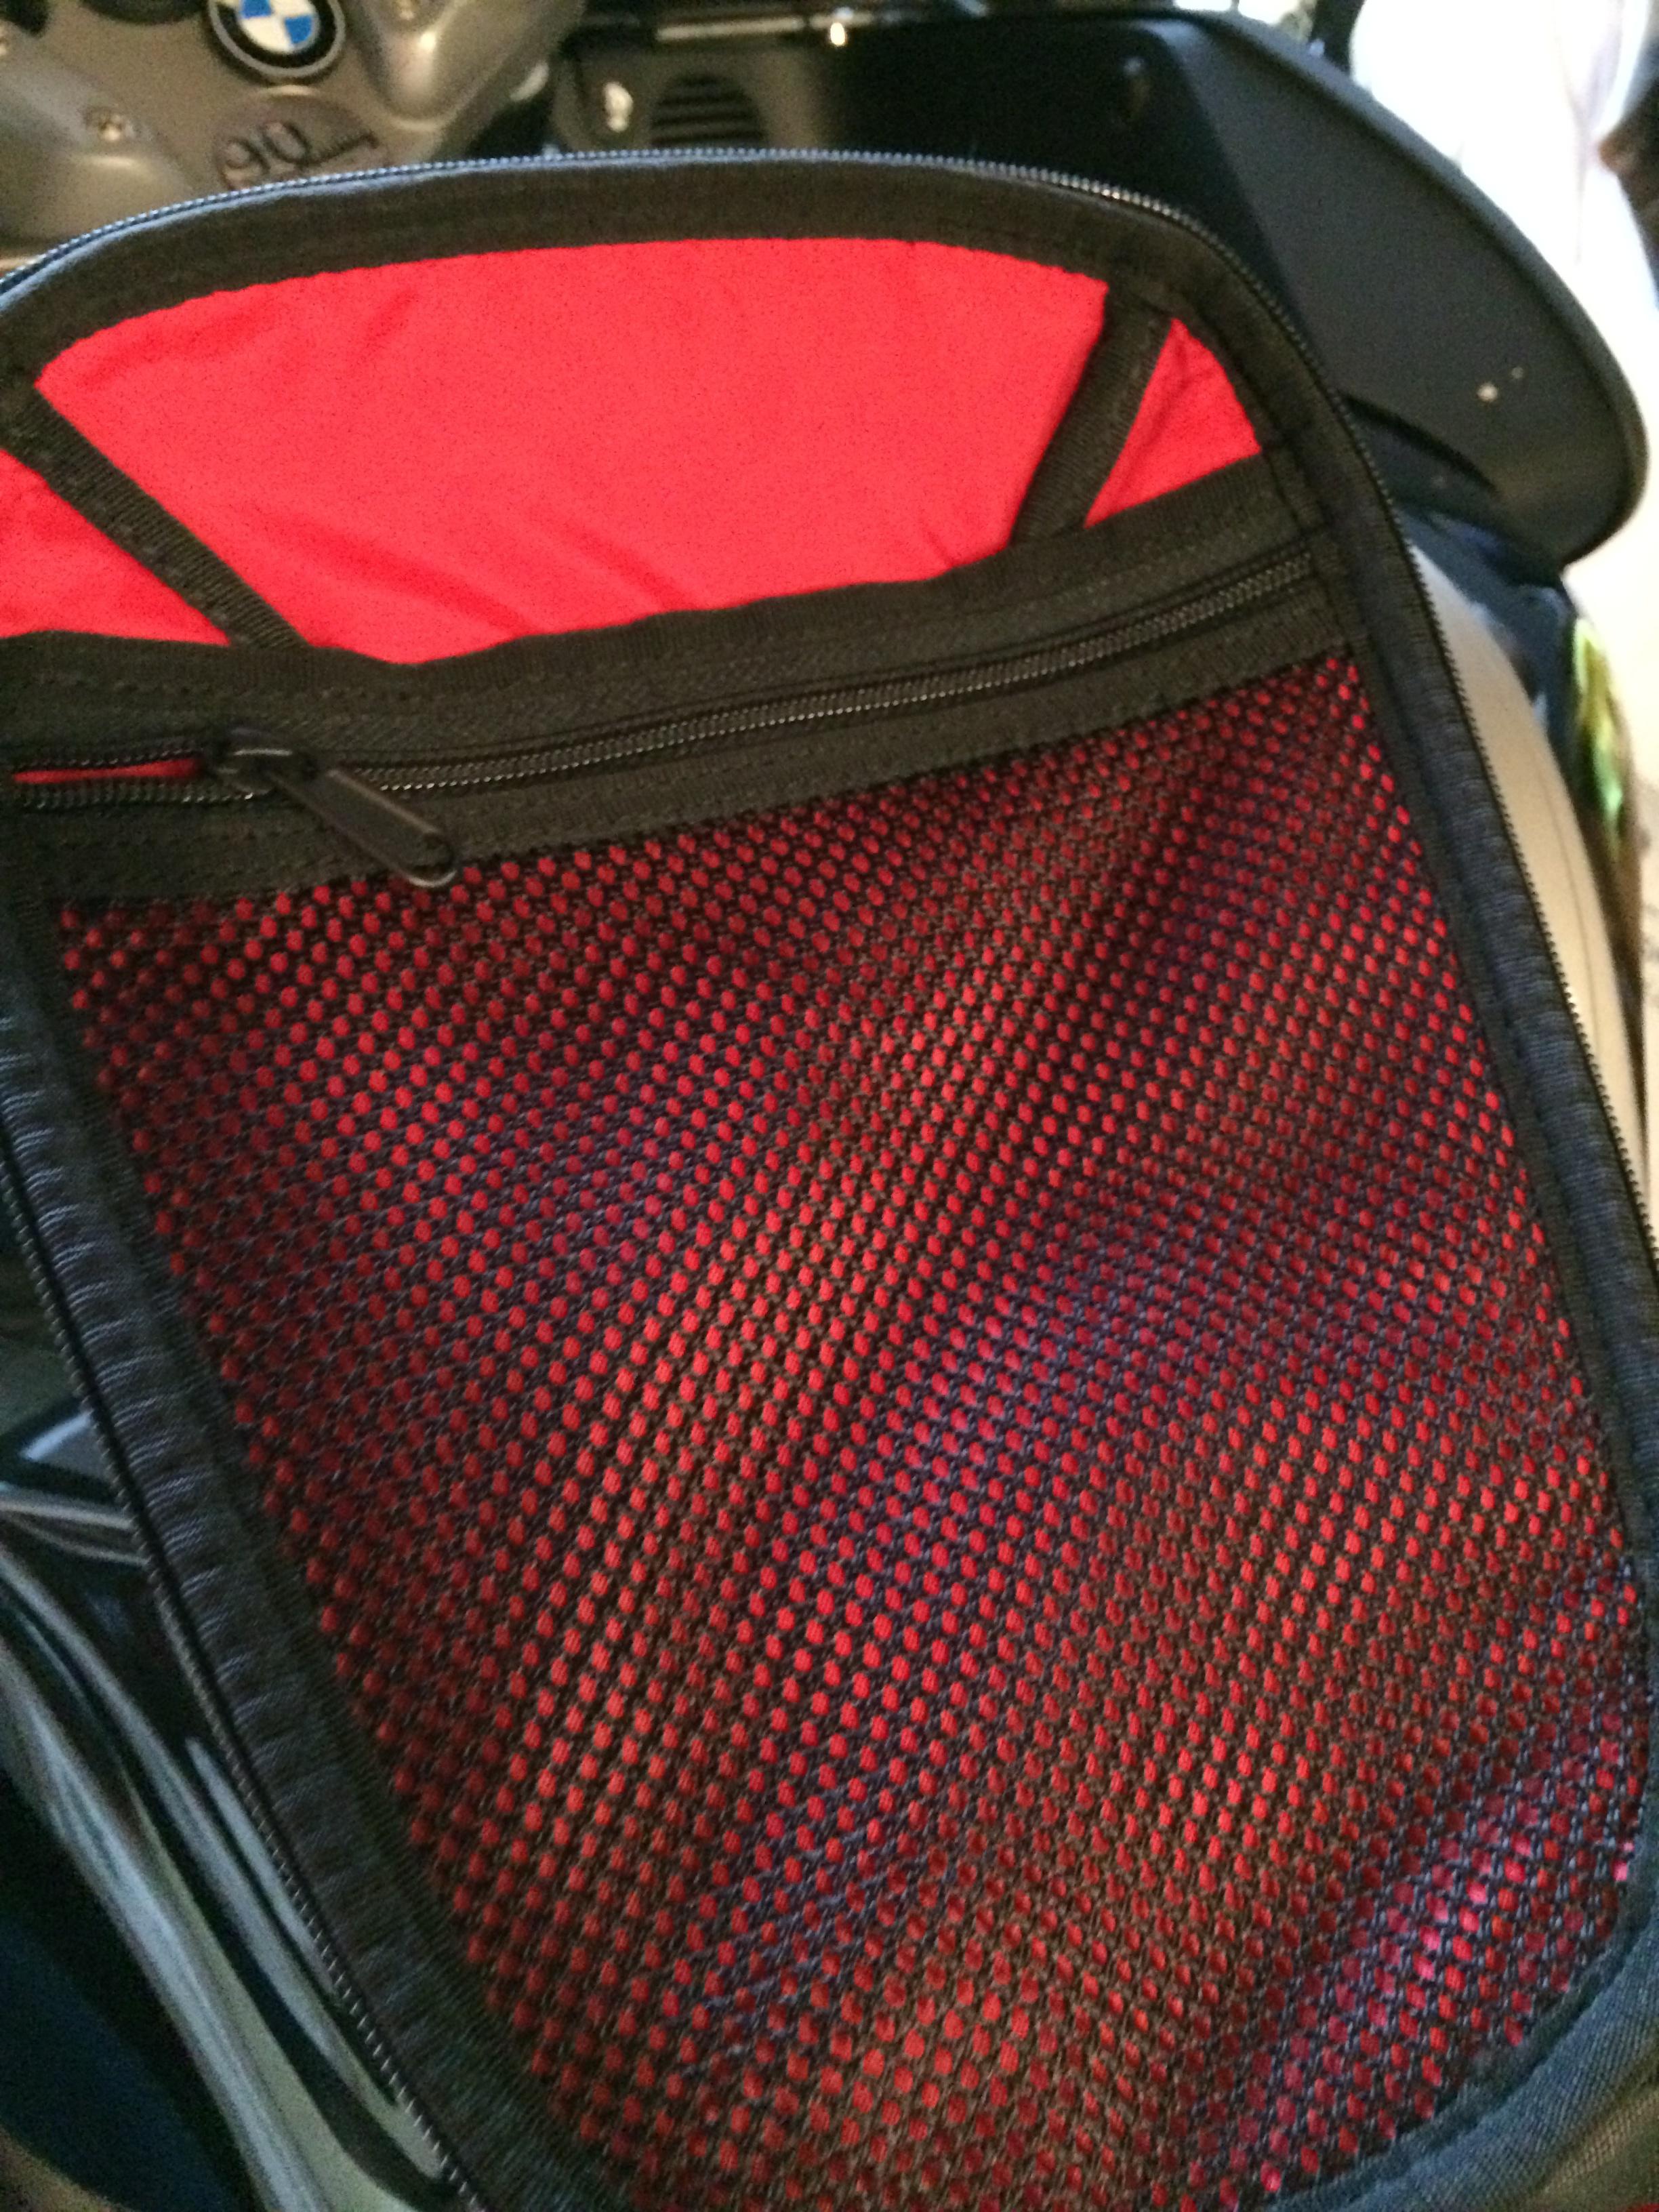 Bag Lid View Pocket.JPG